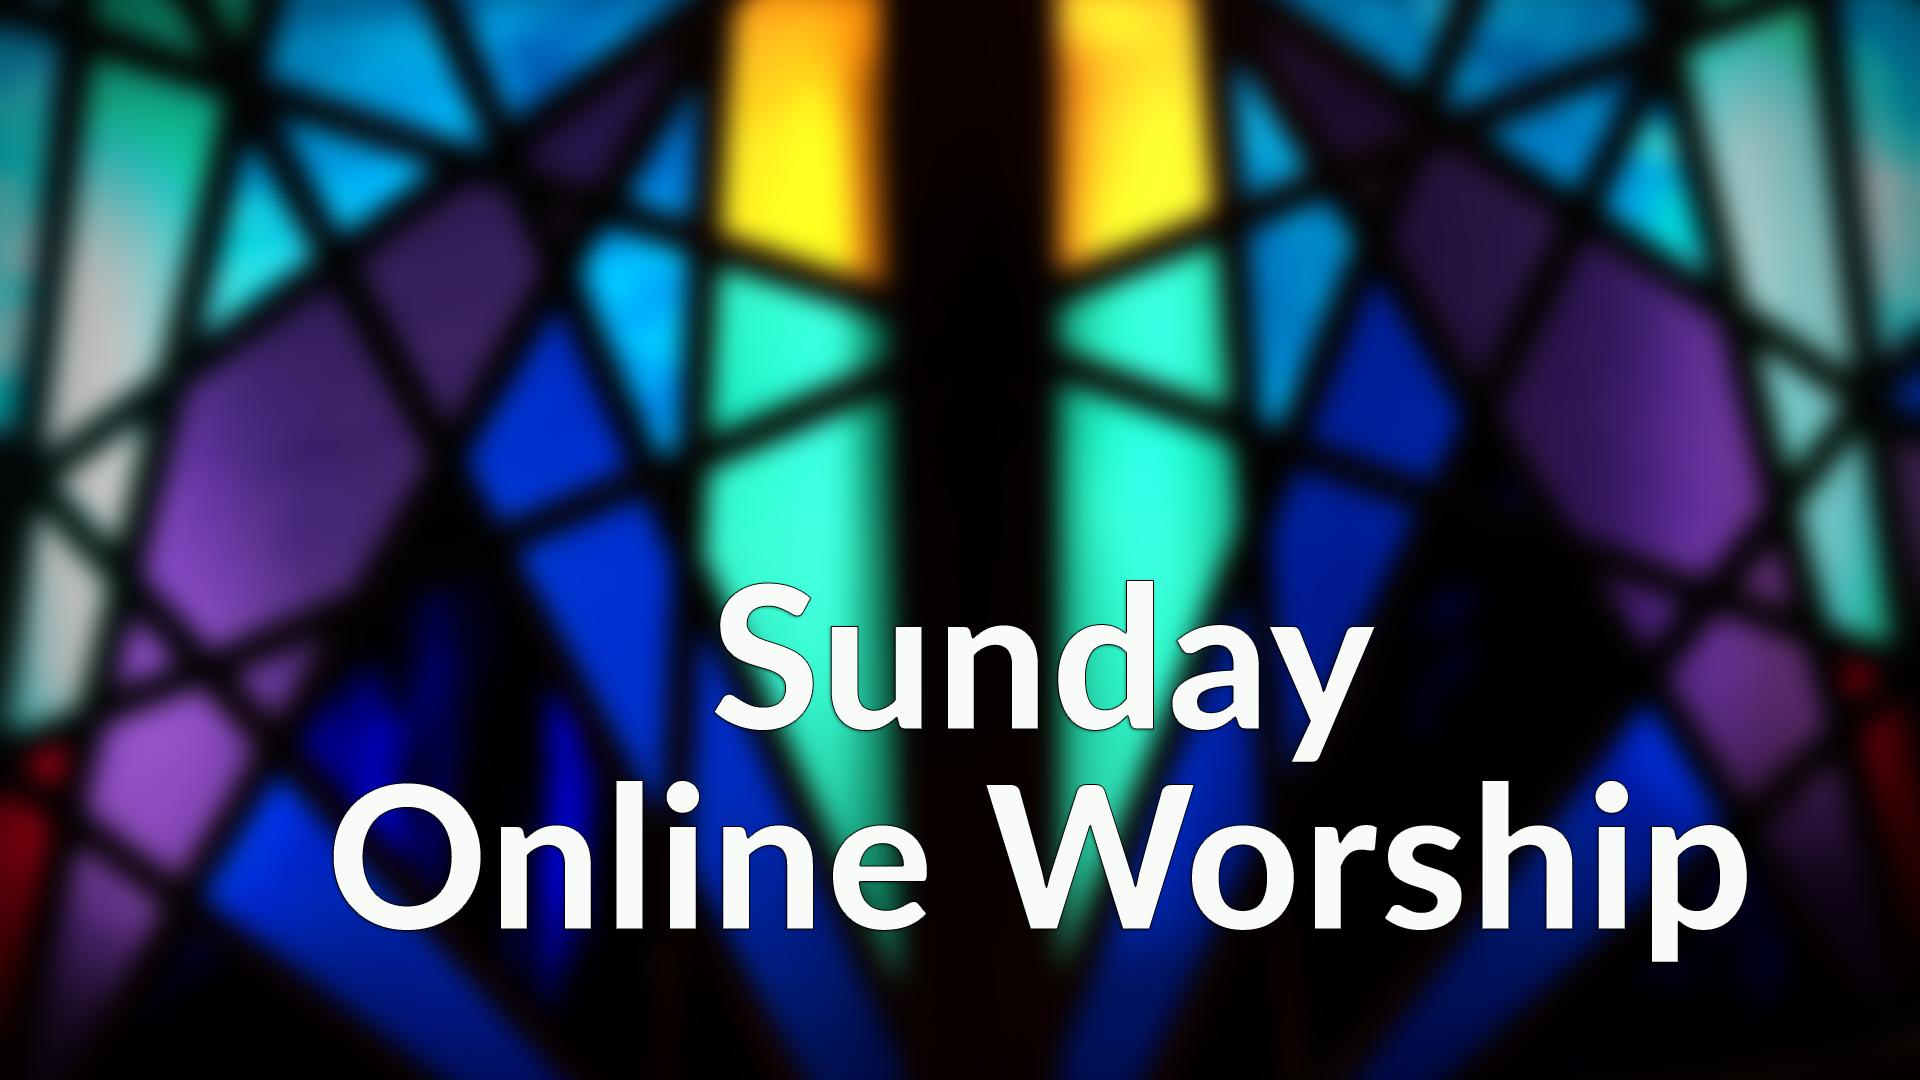 Live Worship Link for Sunday, October 24, 2021